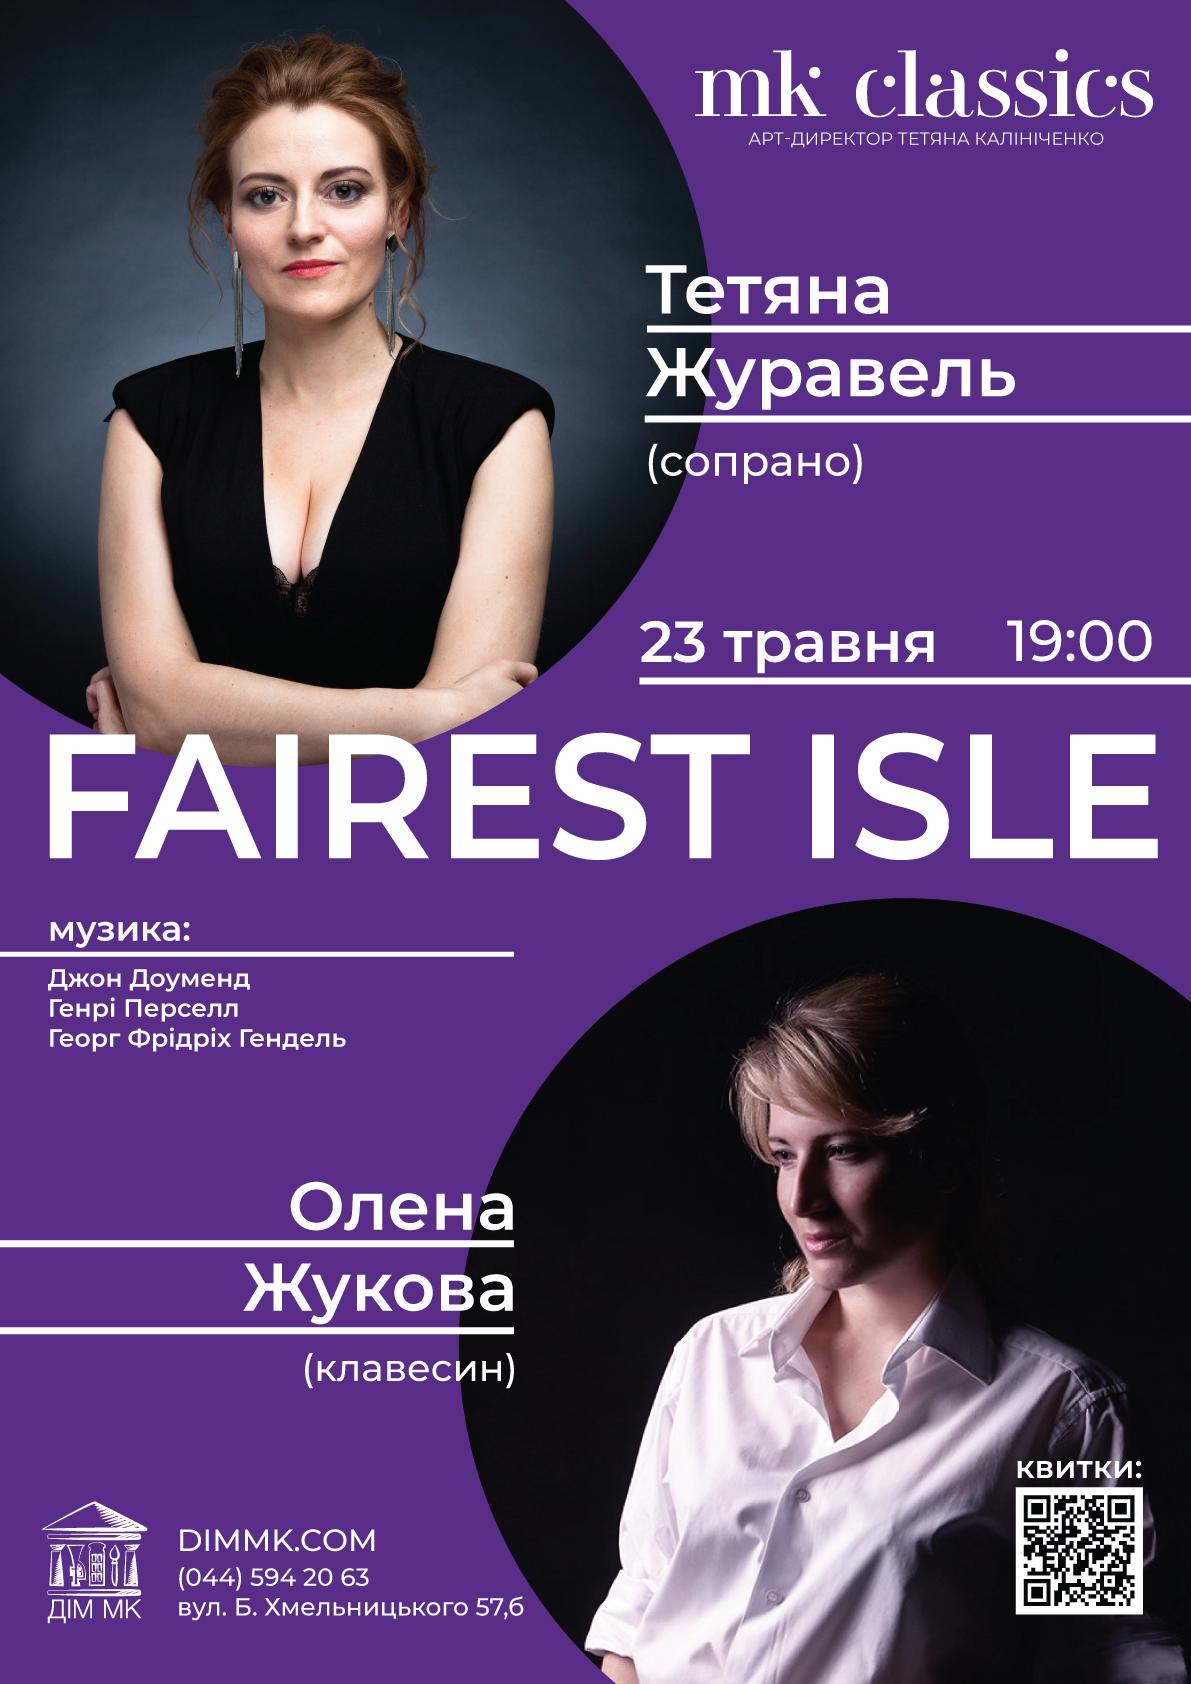 Придбати квитки на Fairest Isle: Тетяна Журавель, сопрано / Олена Жукова, клавесин: